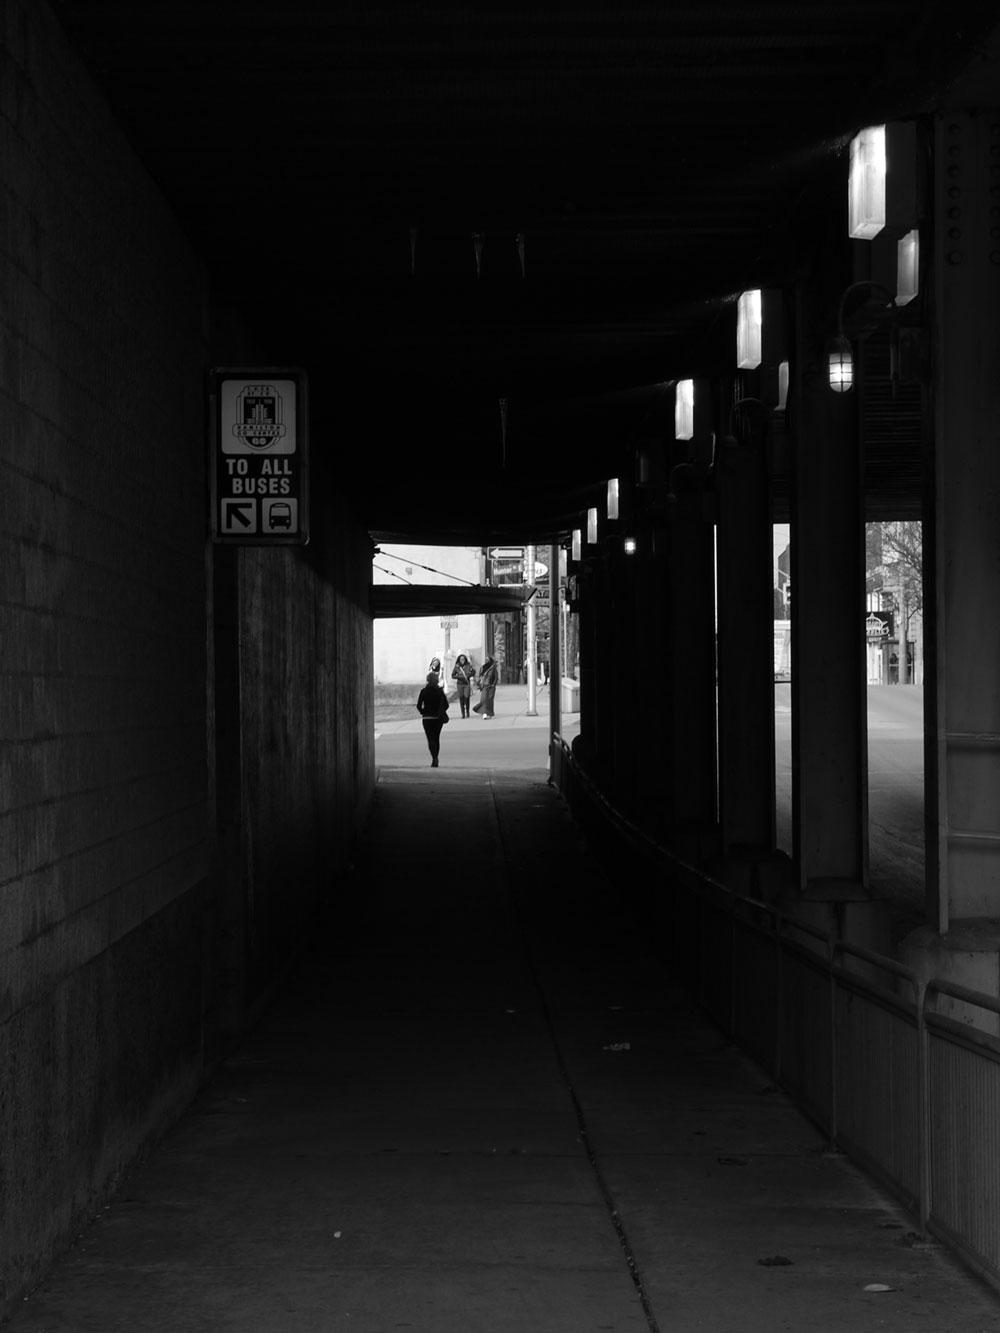 08Urban2012-01-DW-Downtown800-copy.jpg